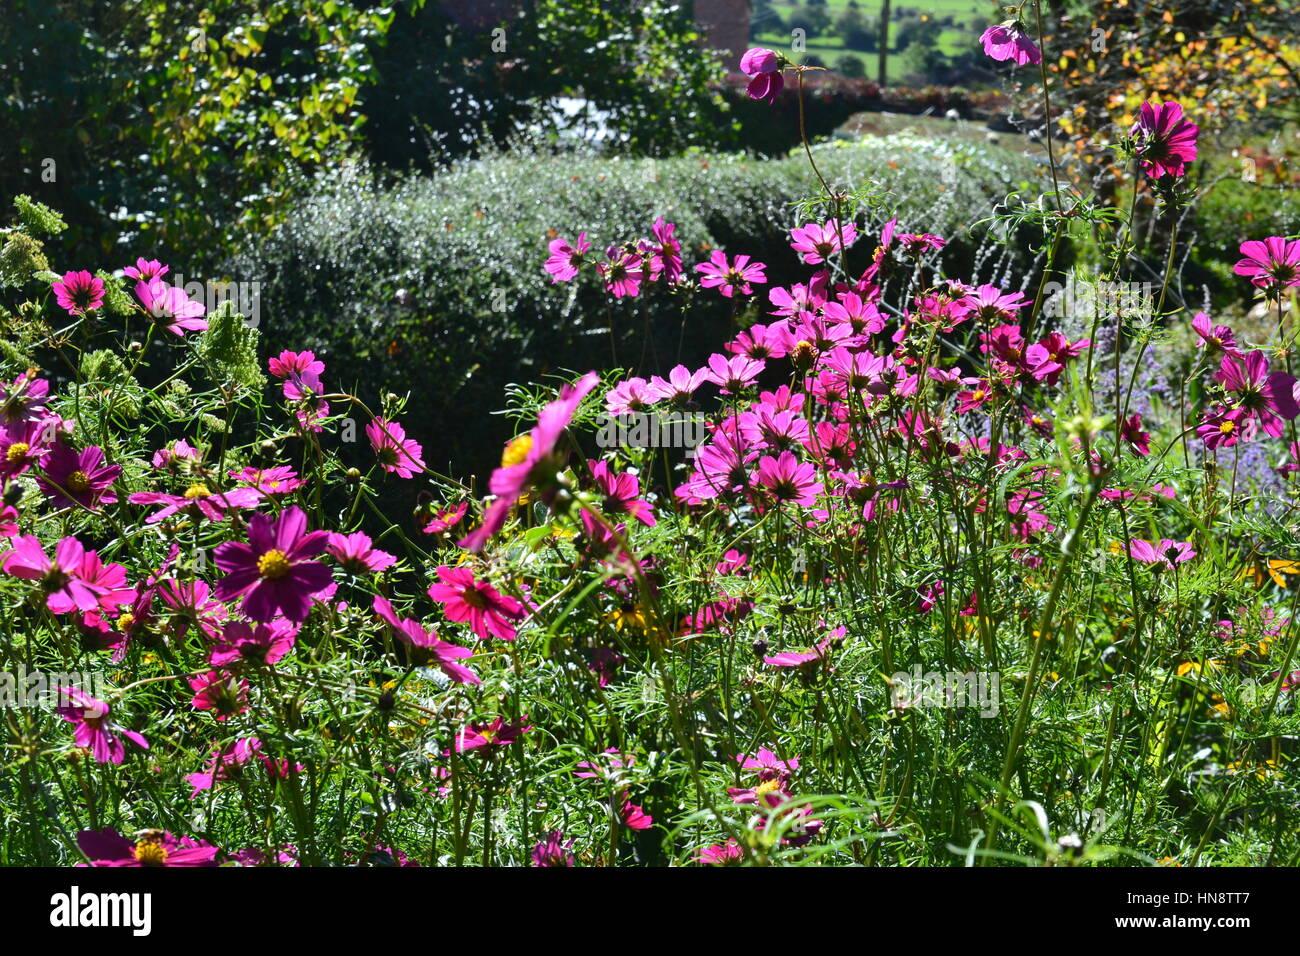 Chalice Well Gardens, Glastonbury, Somerset, Avalon, UK - Stock Image